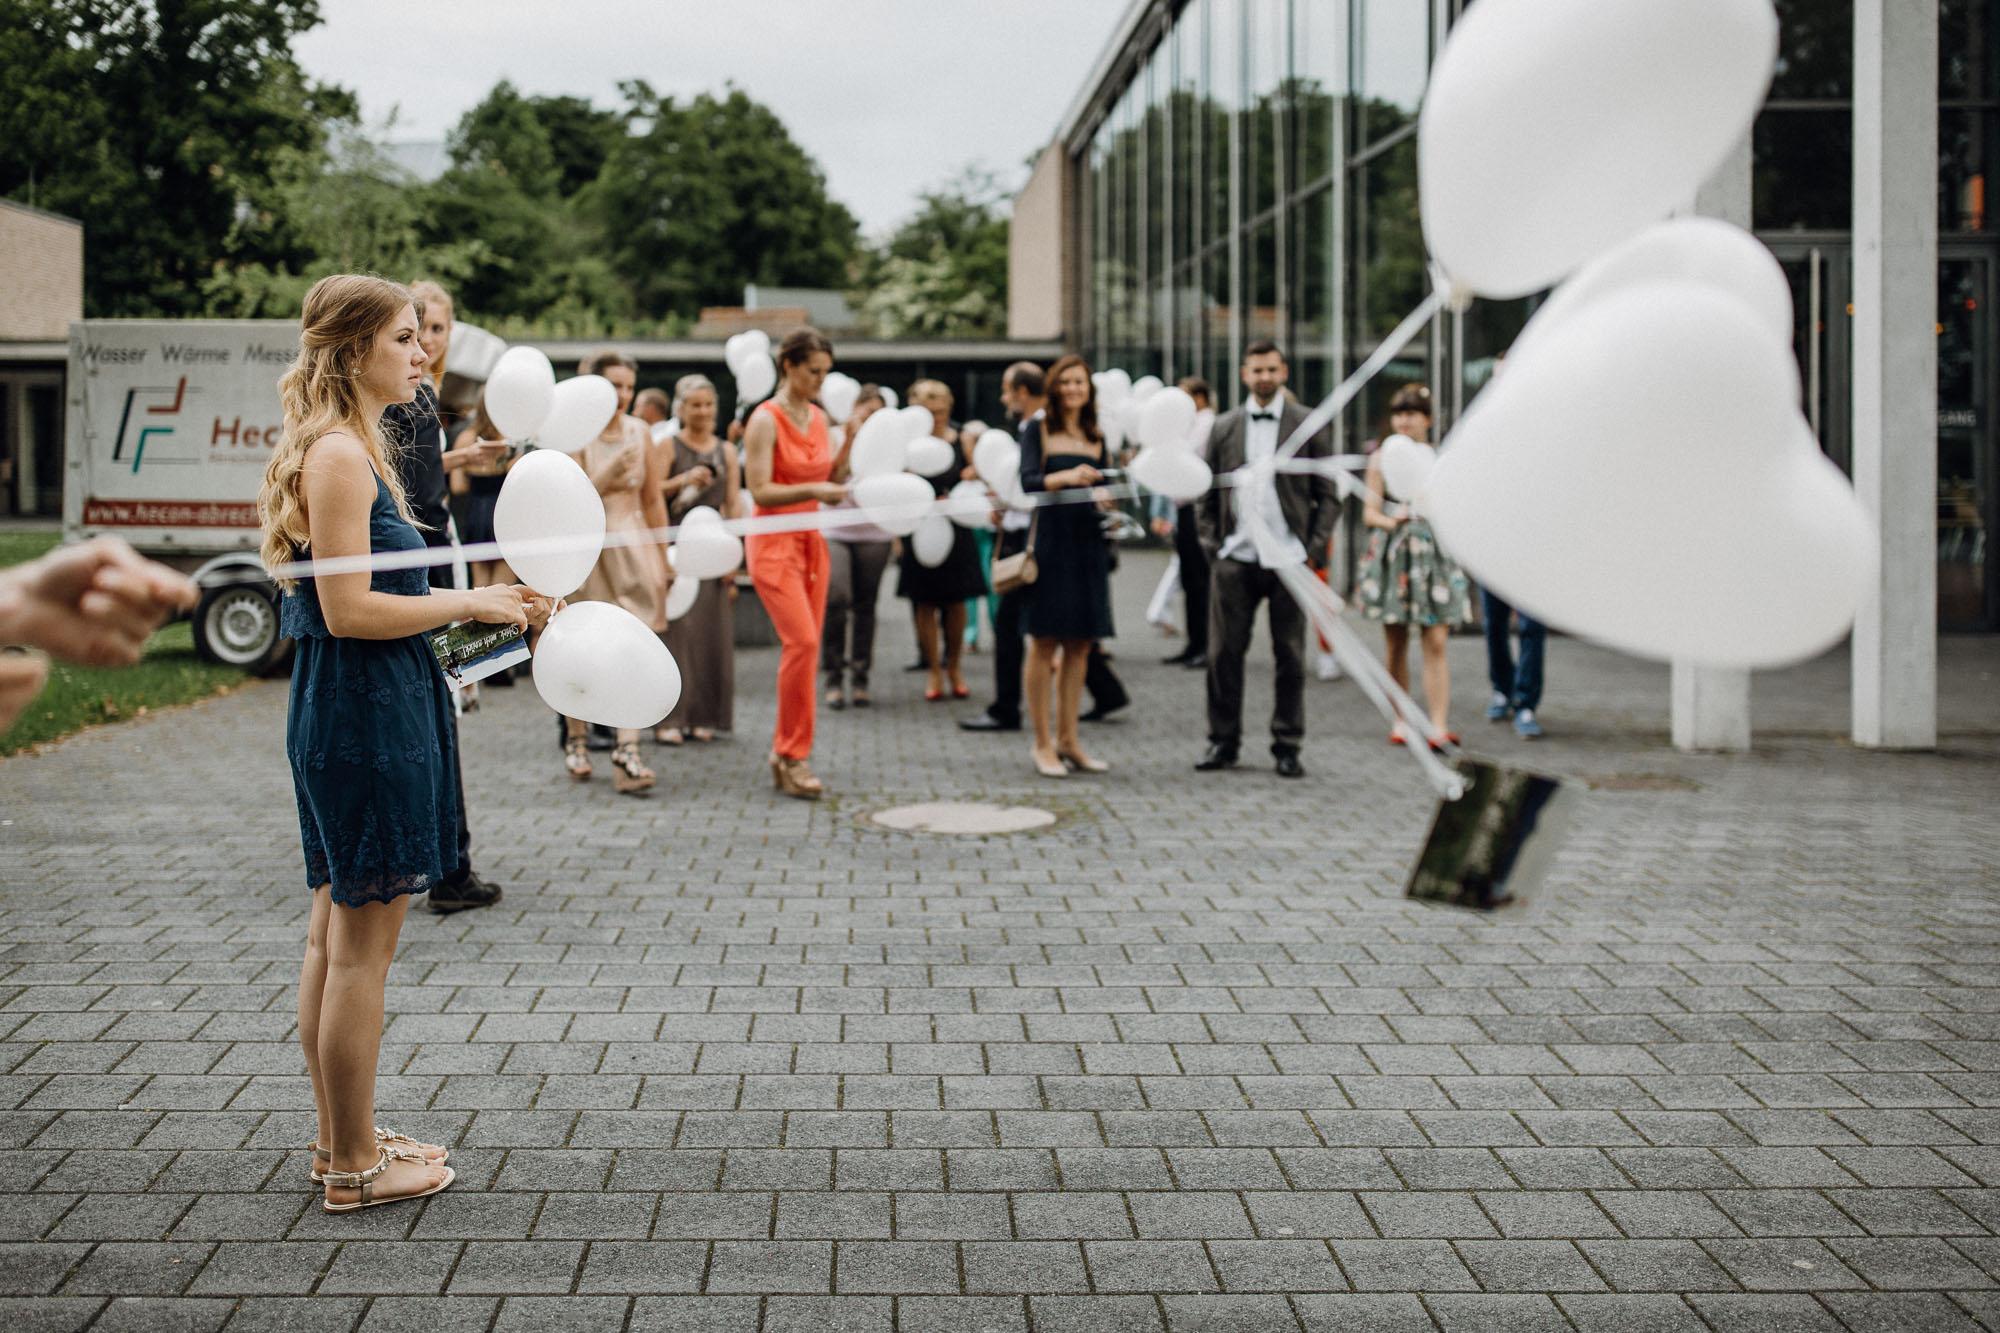 raissa simon photography destination wedding munich black forest offenburg 109 - Claudia + Christoph